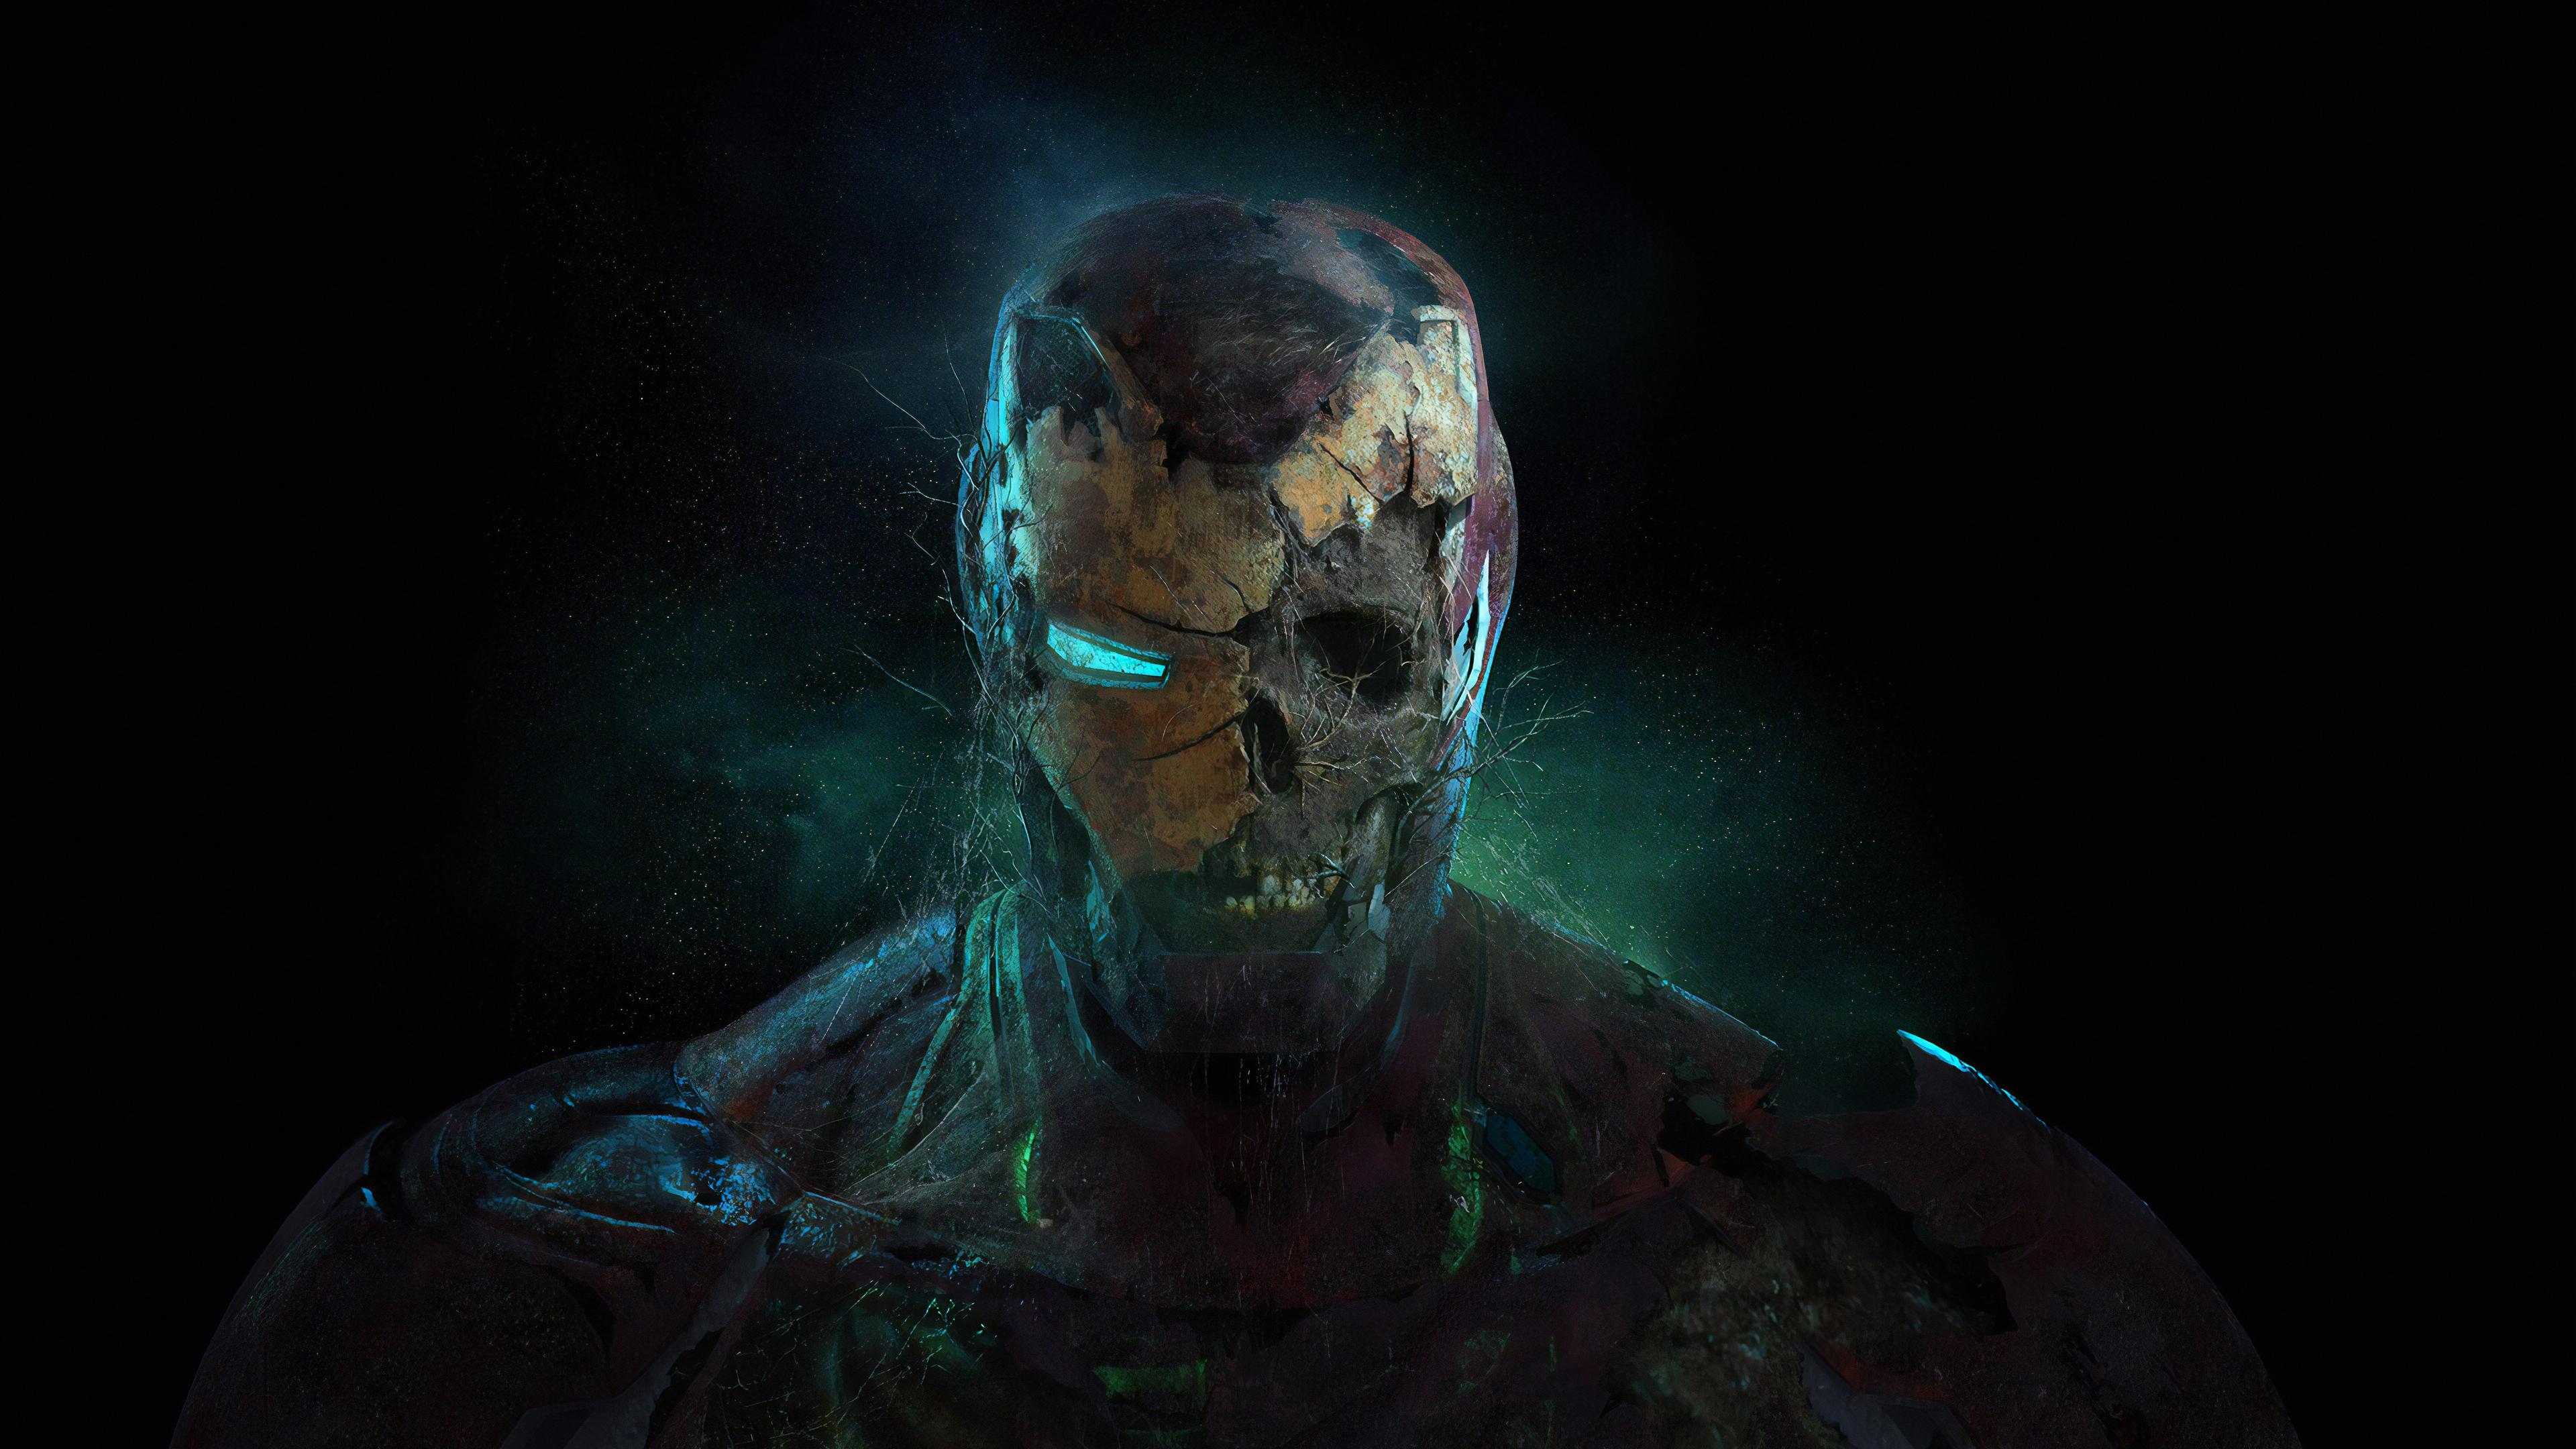 zombie iron man 1570393610 - Zombie Iron Man - superheroes wallpapers, iron man wallpapers, hd-wallpapers, digital art wallpapers, artwork wallpapers, artstation wallpapers, 4k-wallpapers